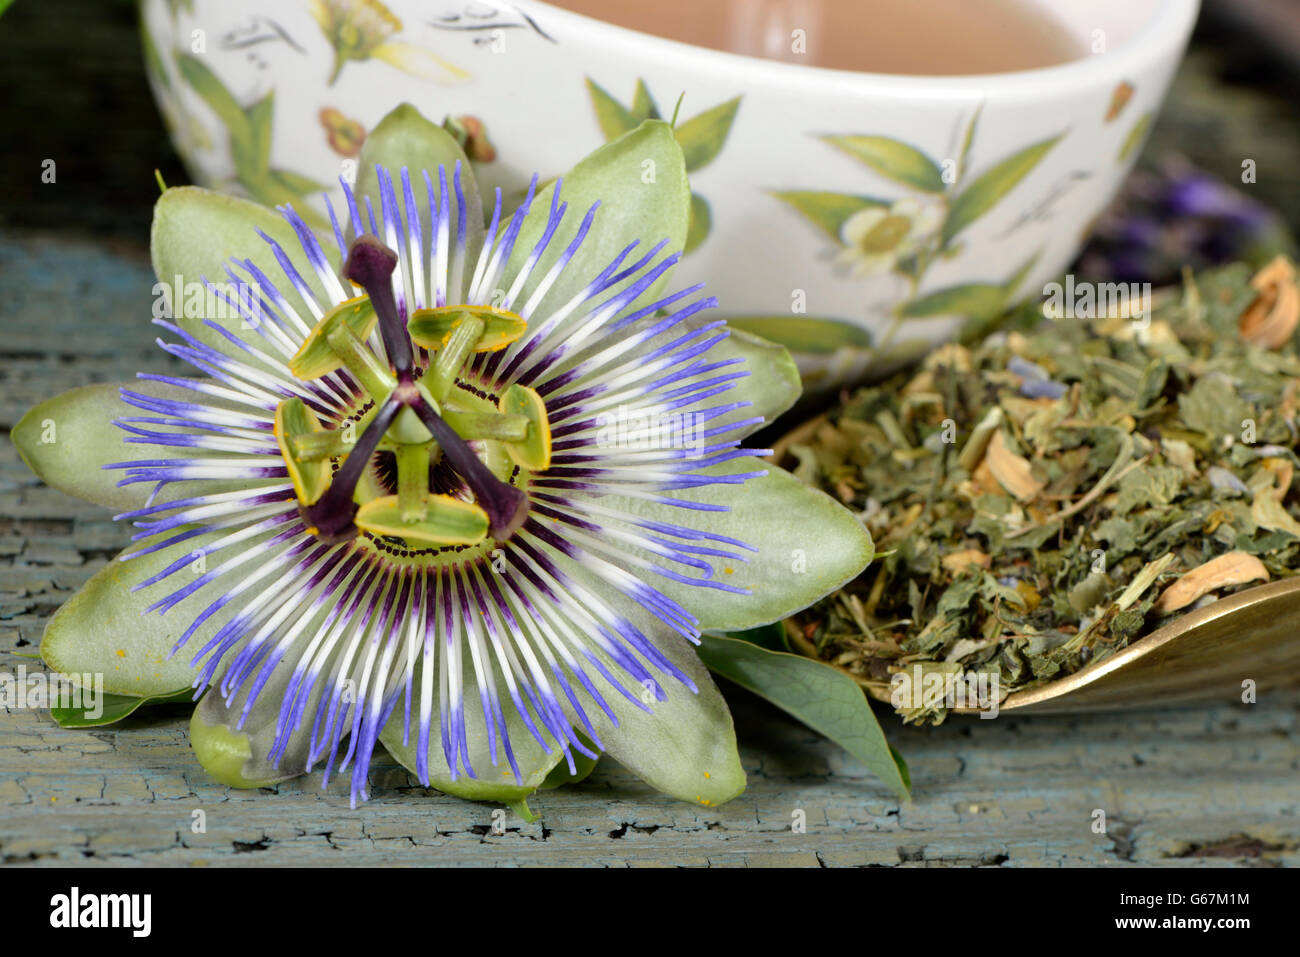 Nerves and calming tea, Sweet orange blossom, Balm, St John's wort, Amber, Lavender, Hop, Passion flower herb / - Stock Image